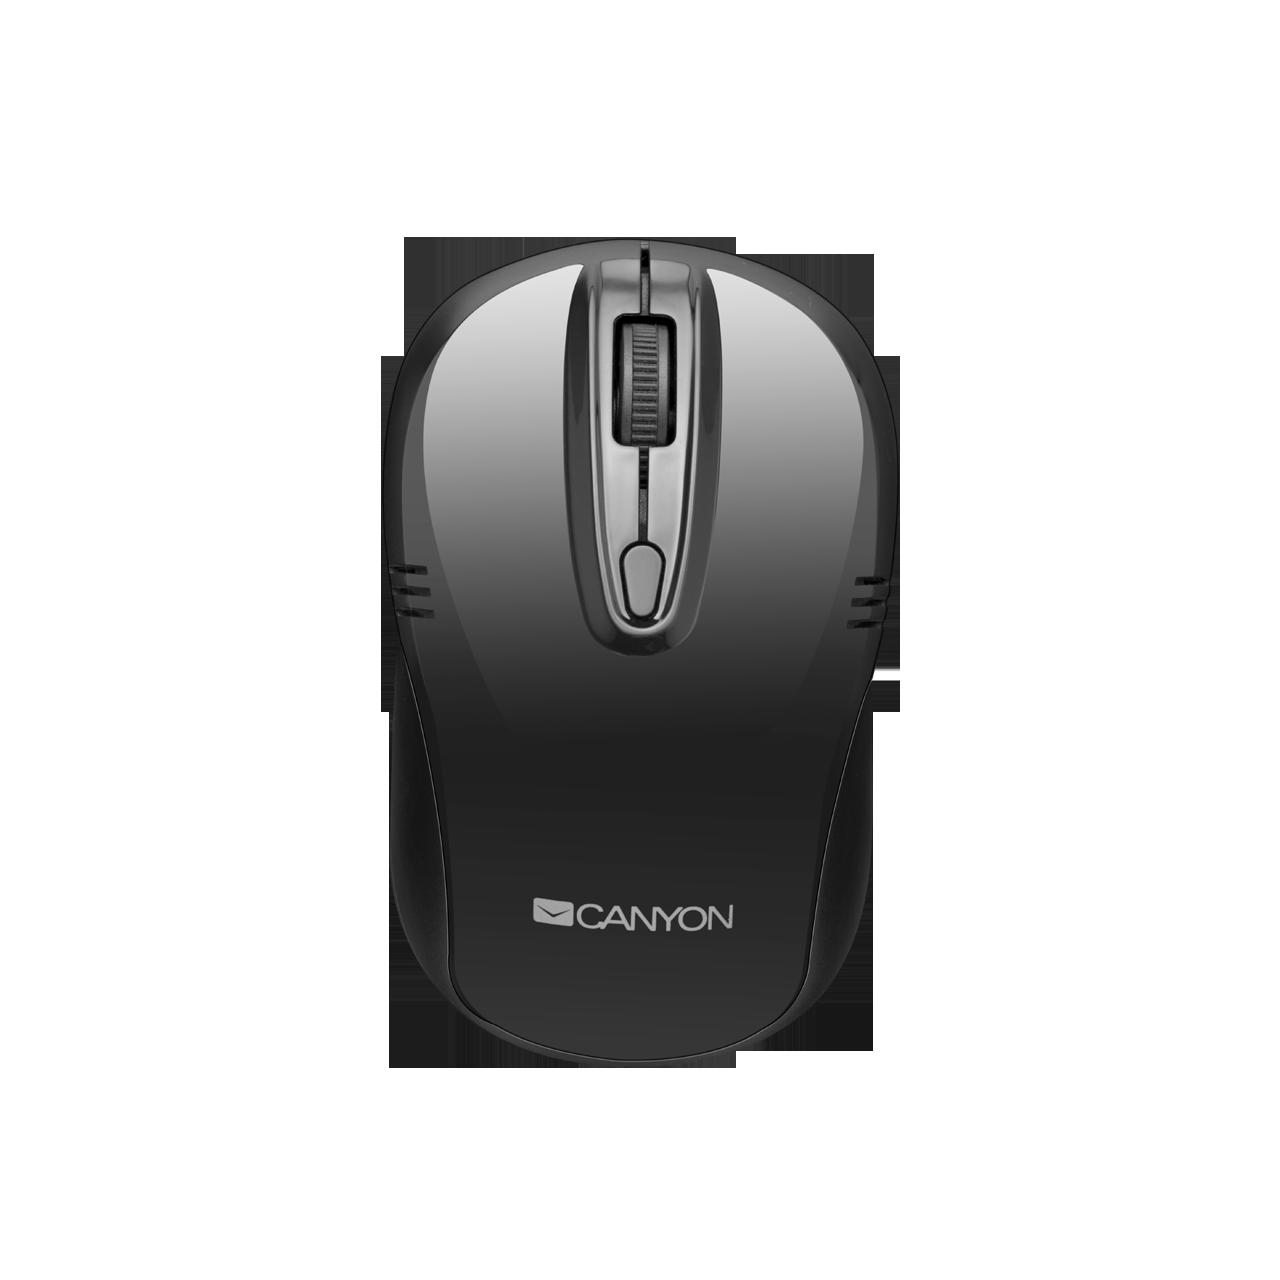 Mouse Wireless Cabyon CNE-CMSW02 Negru